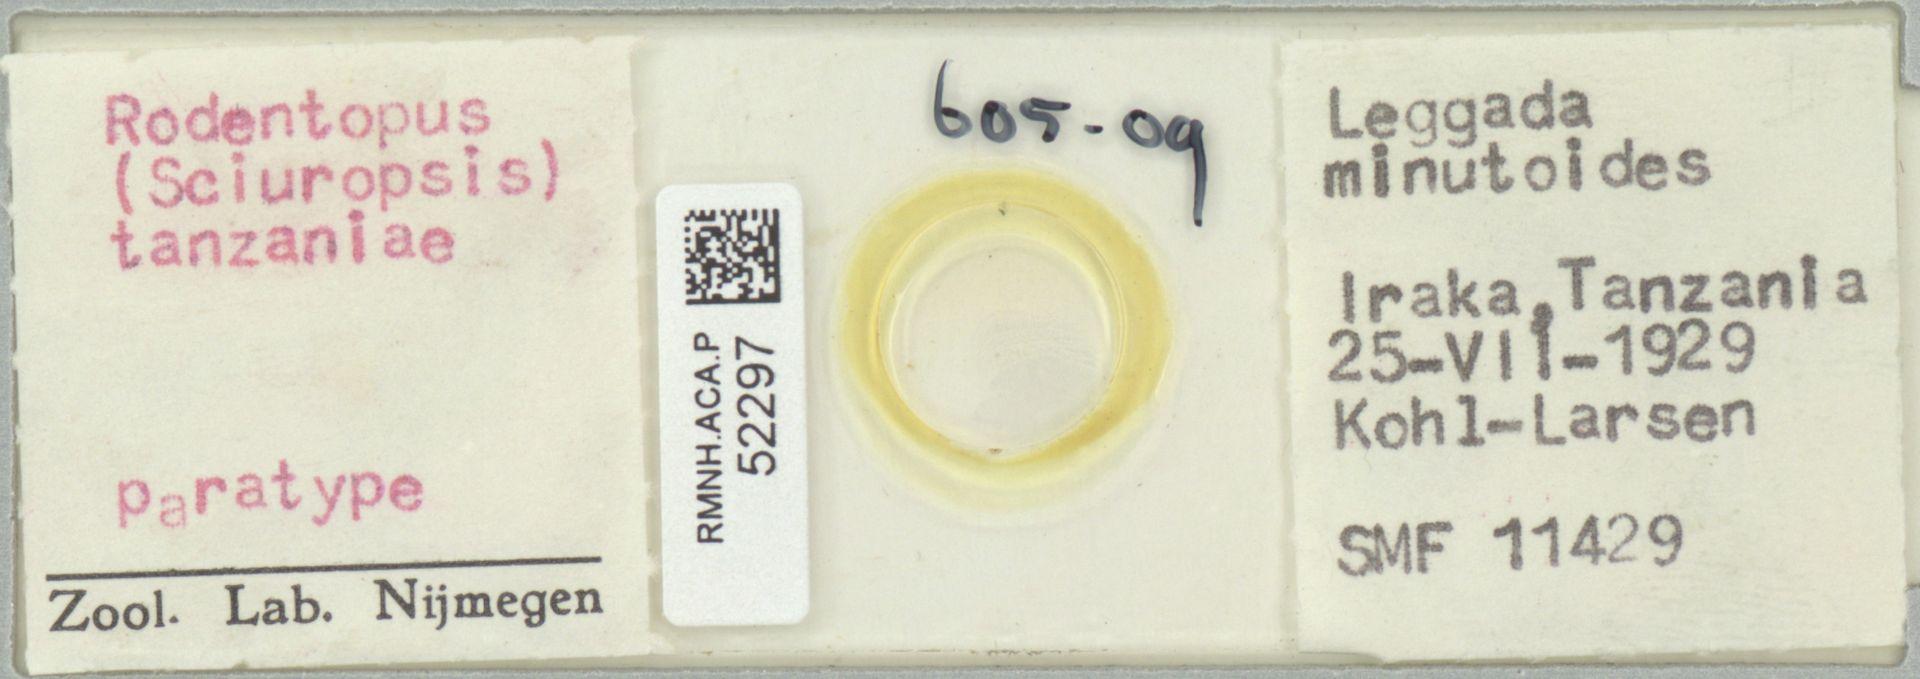 RMNH.ACA.P.52297 | Rodentopus (Sciuropsis) tanzaniae